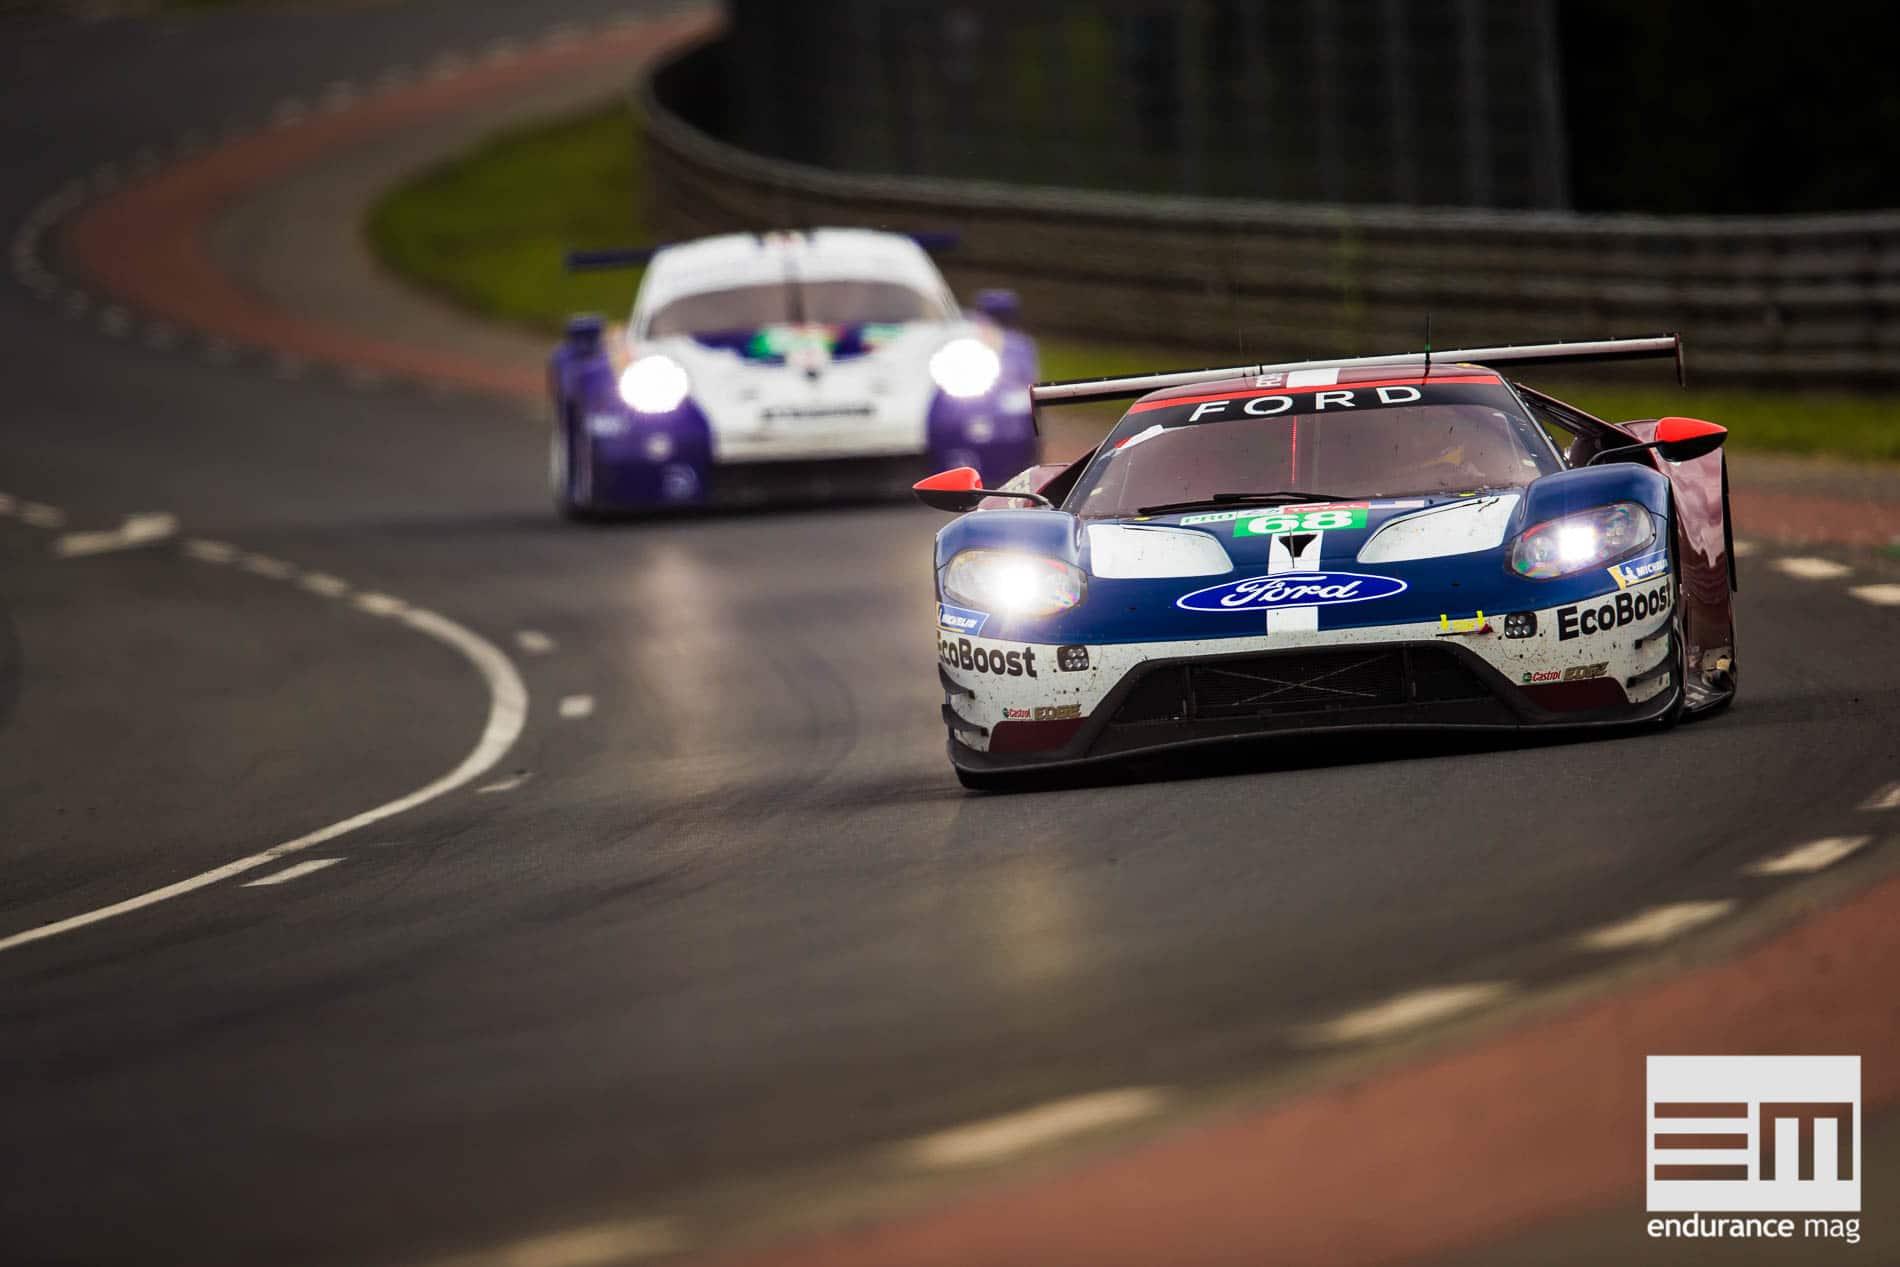 Ford GT : 2018, lutte intense contre Porsche